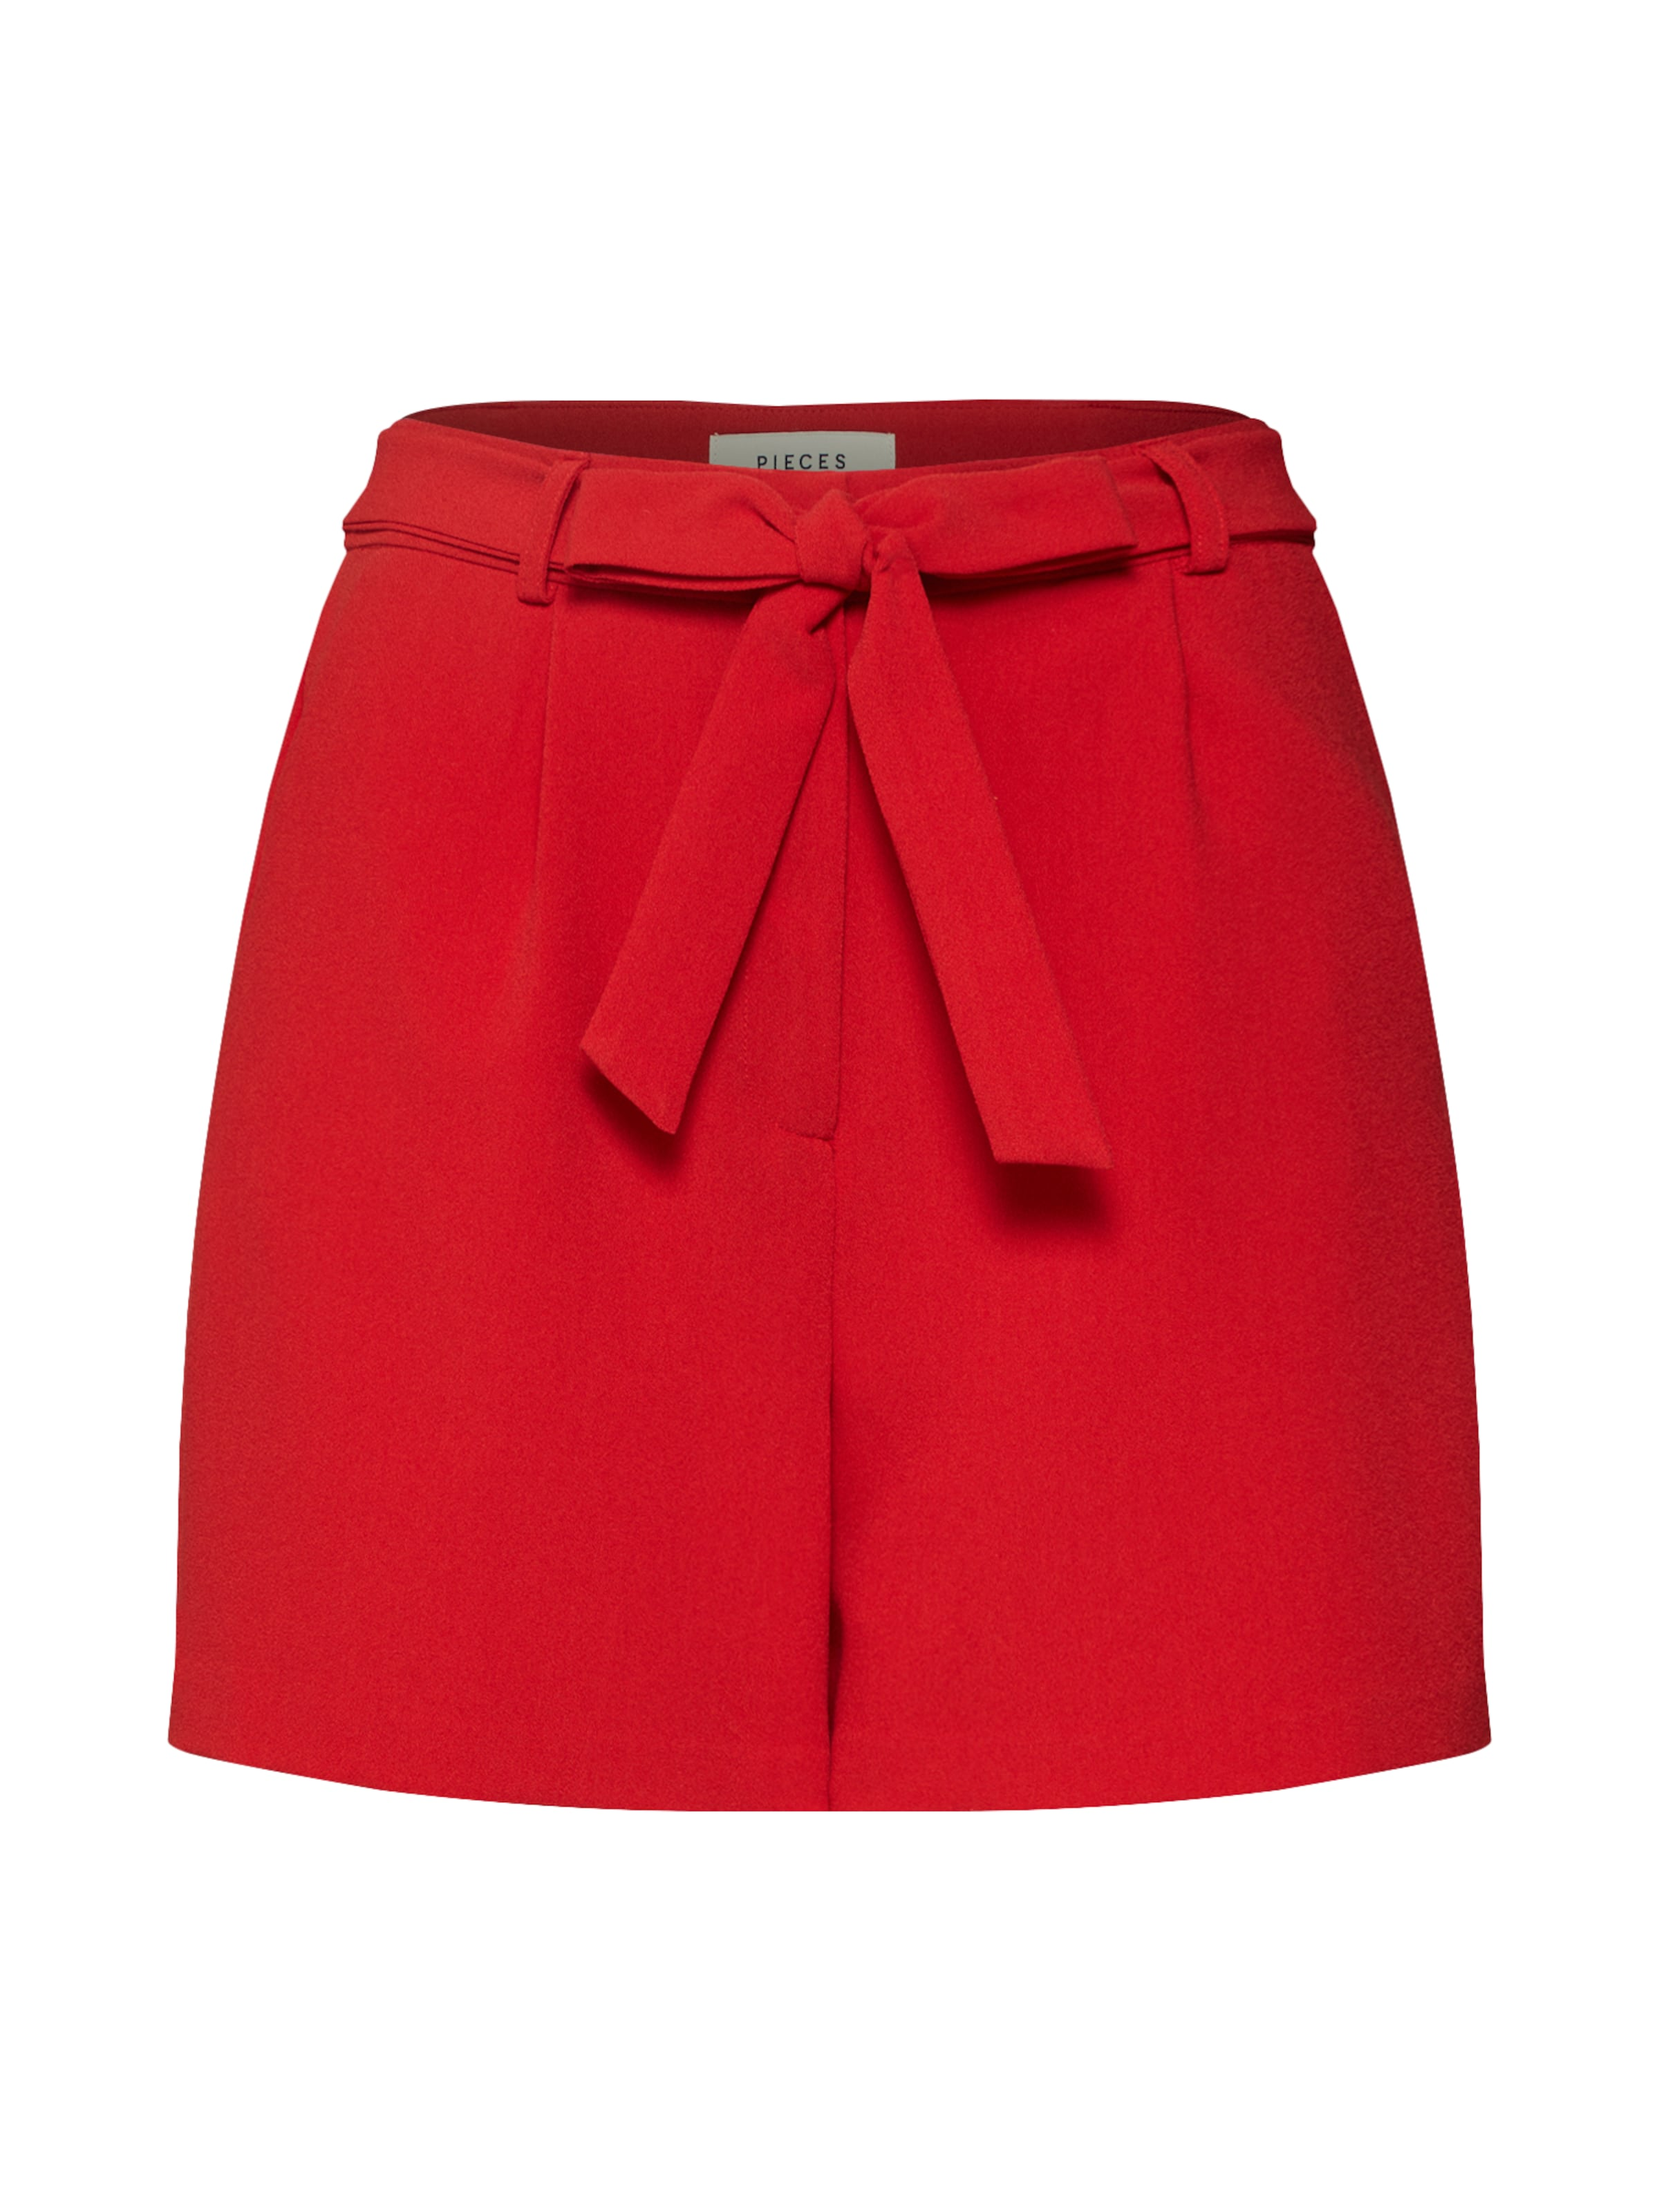 Pieces Pieces Pantalon Pantalon 'hoy' Rouge 'hoy' En 3ALR54j